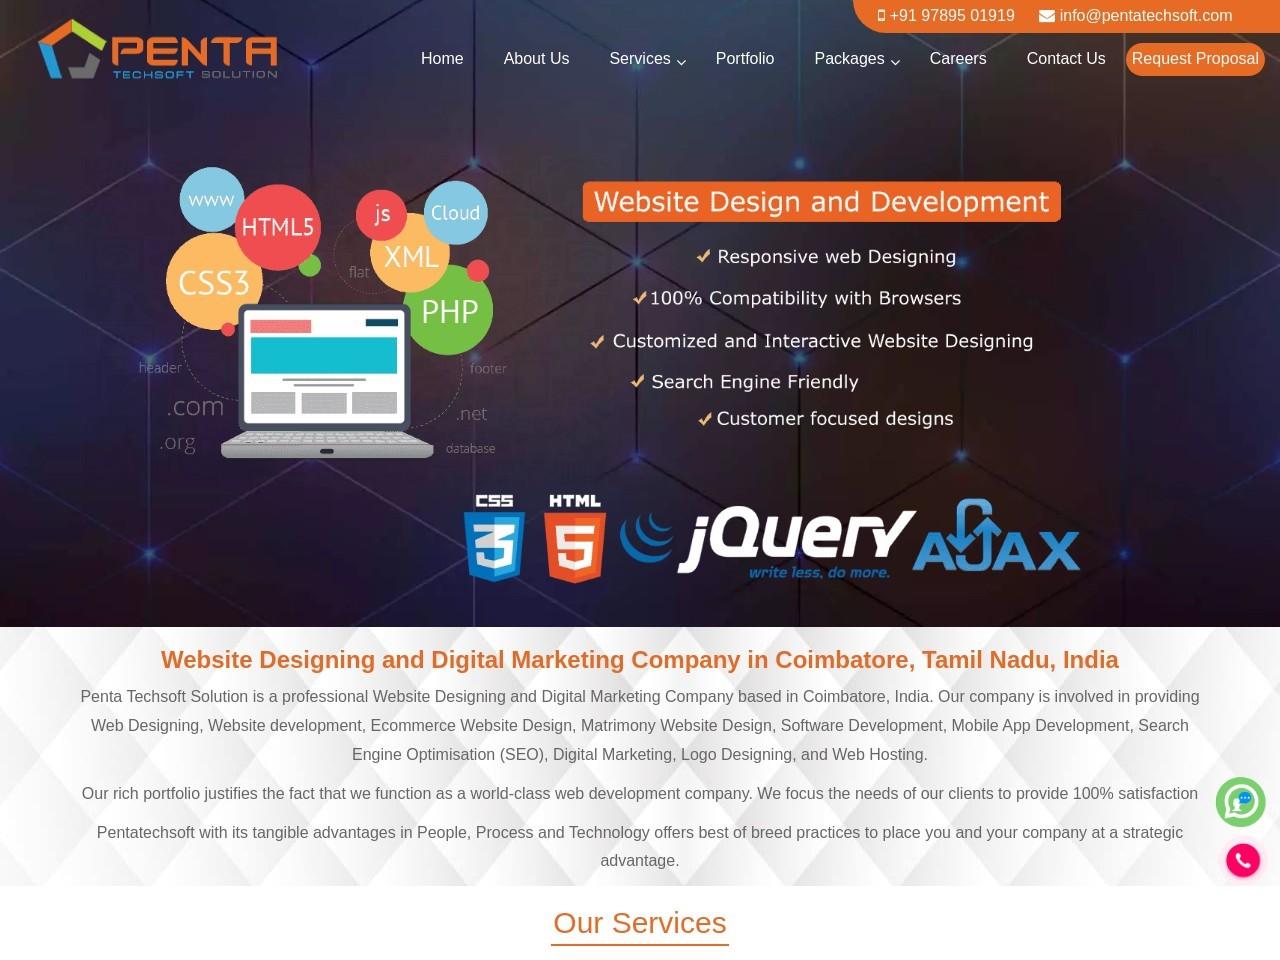 Matrimony Website Design Company In Coimbatore